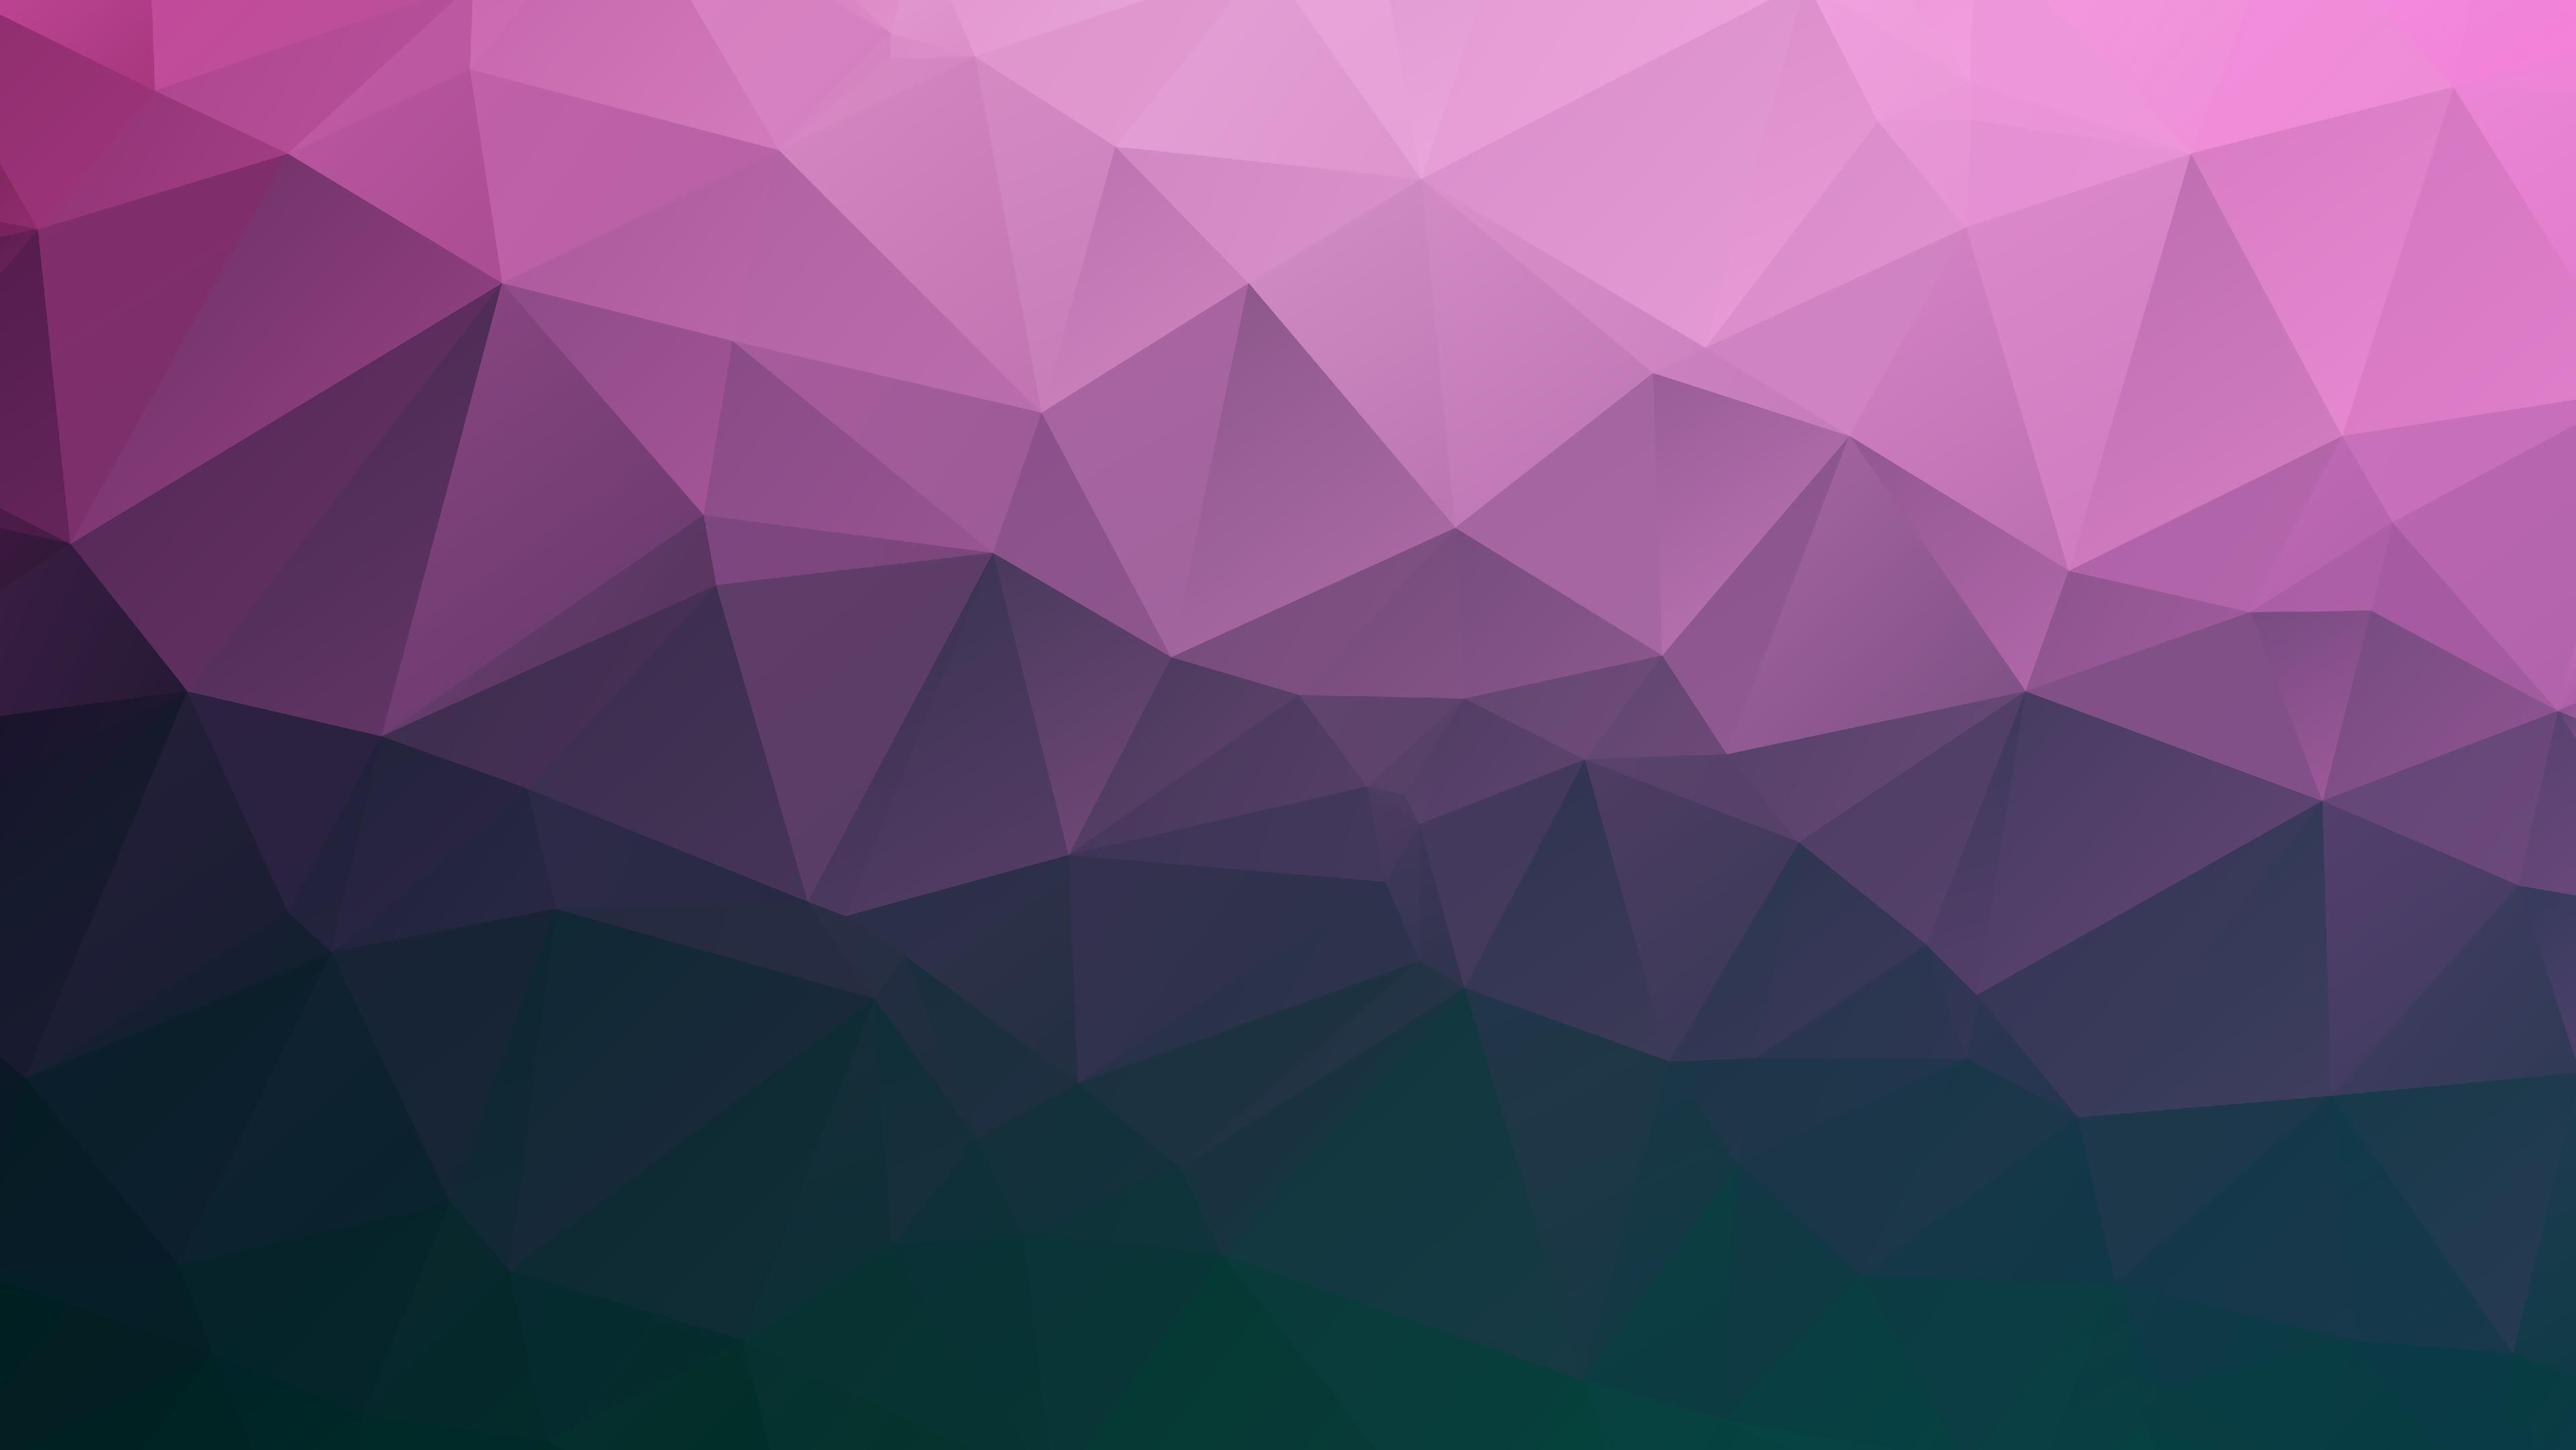 Polygon Triangles Geometric Gradient Lines 4k Wallpaper Hdwallpaper Desktop In 2020 Polygon Hd Wallpaper Geometric